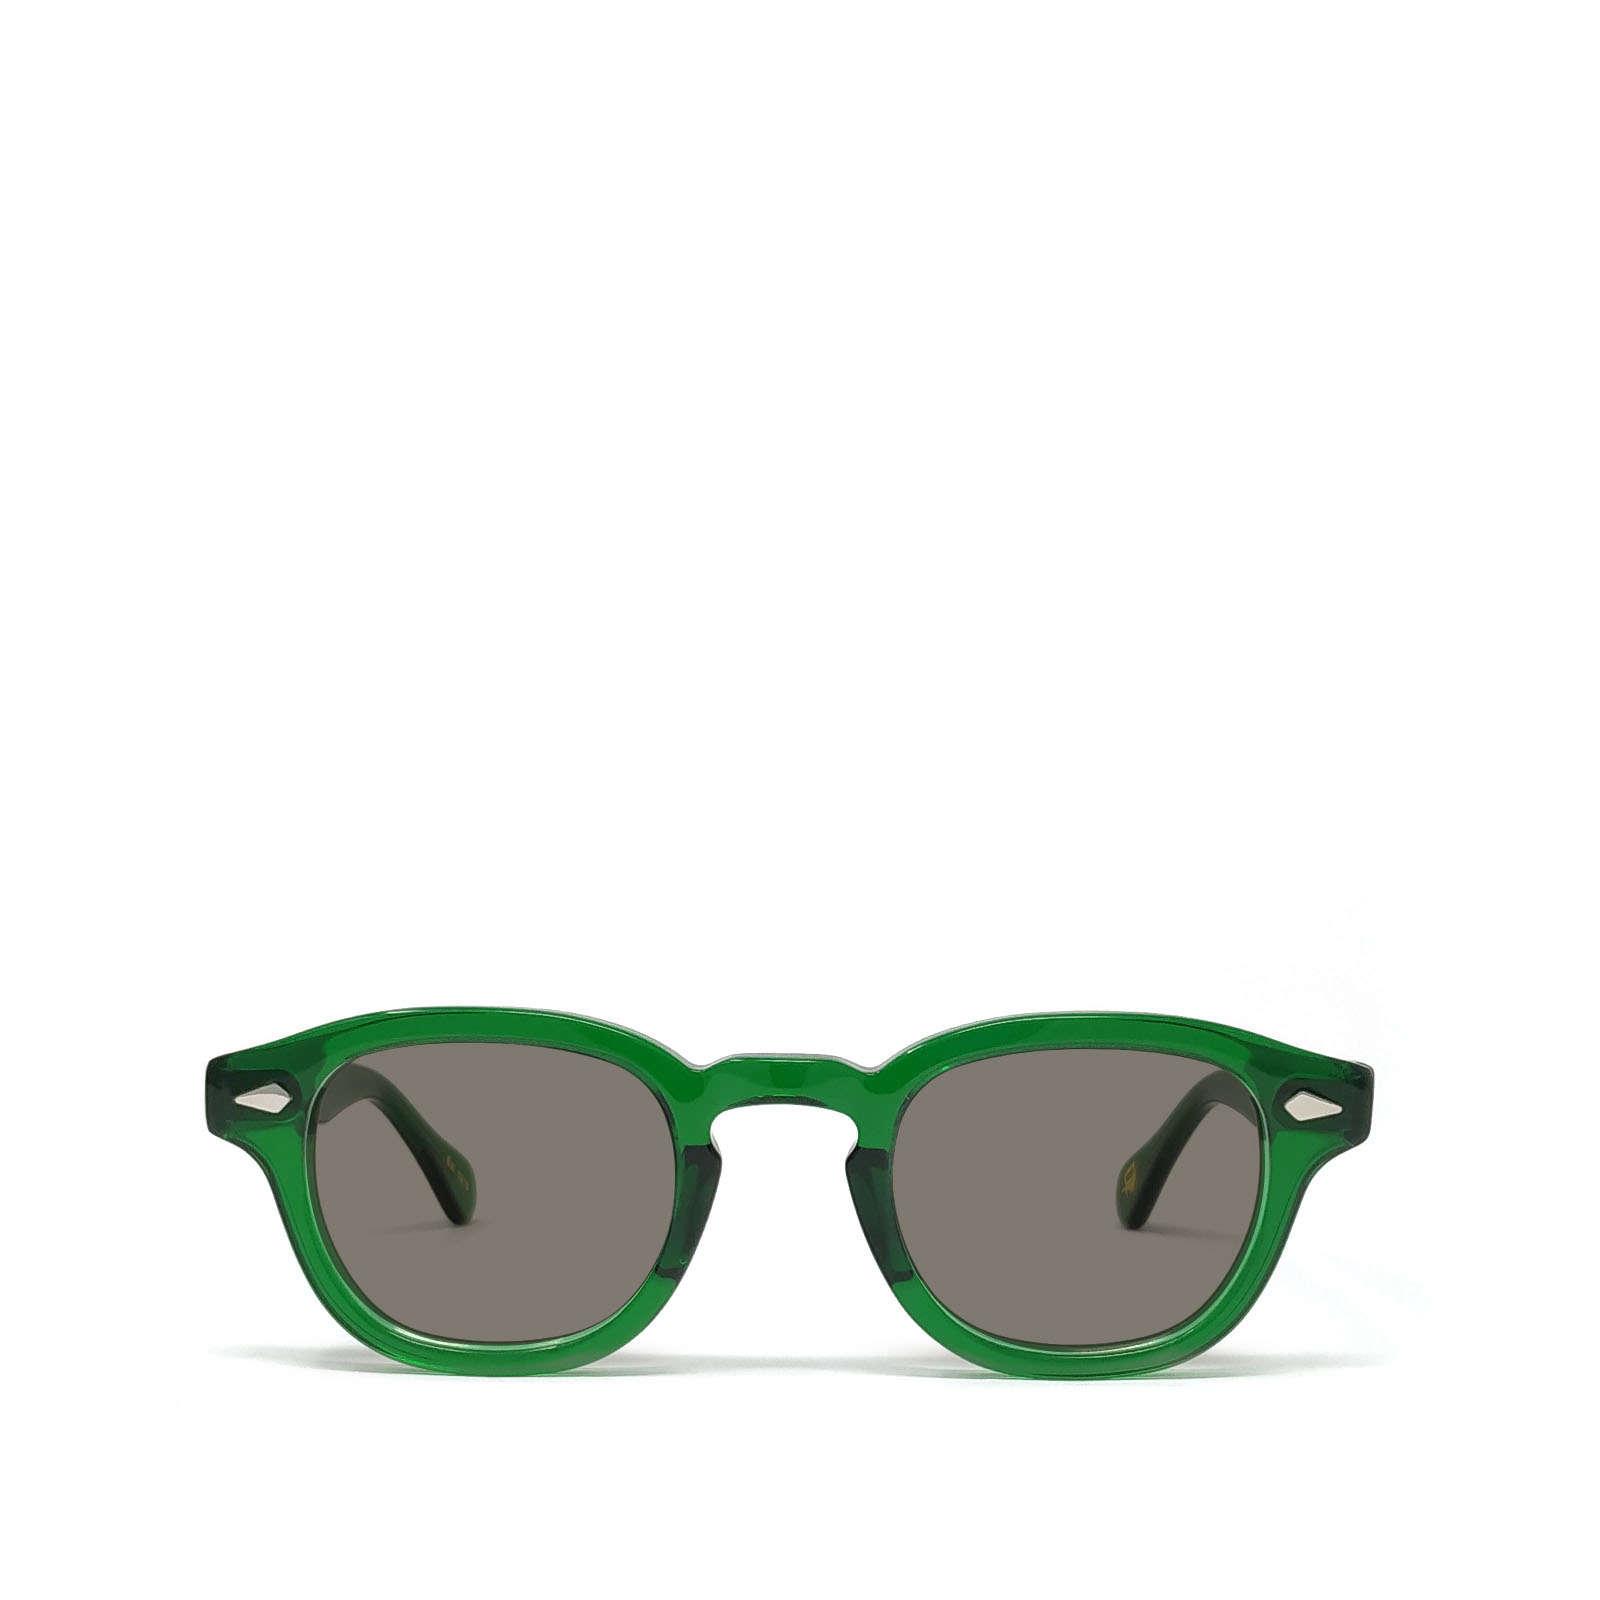 Moscot Moscot Lemtosh Emerald Sunglasses